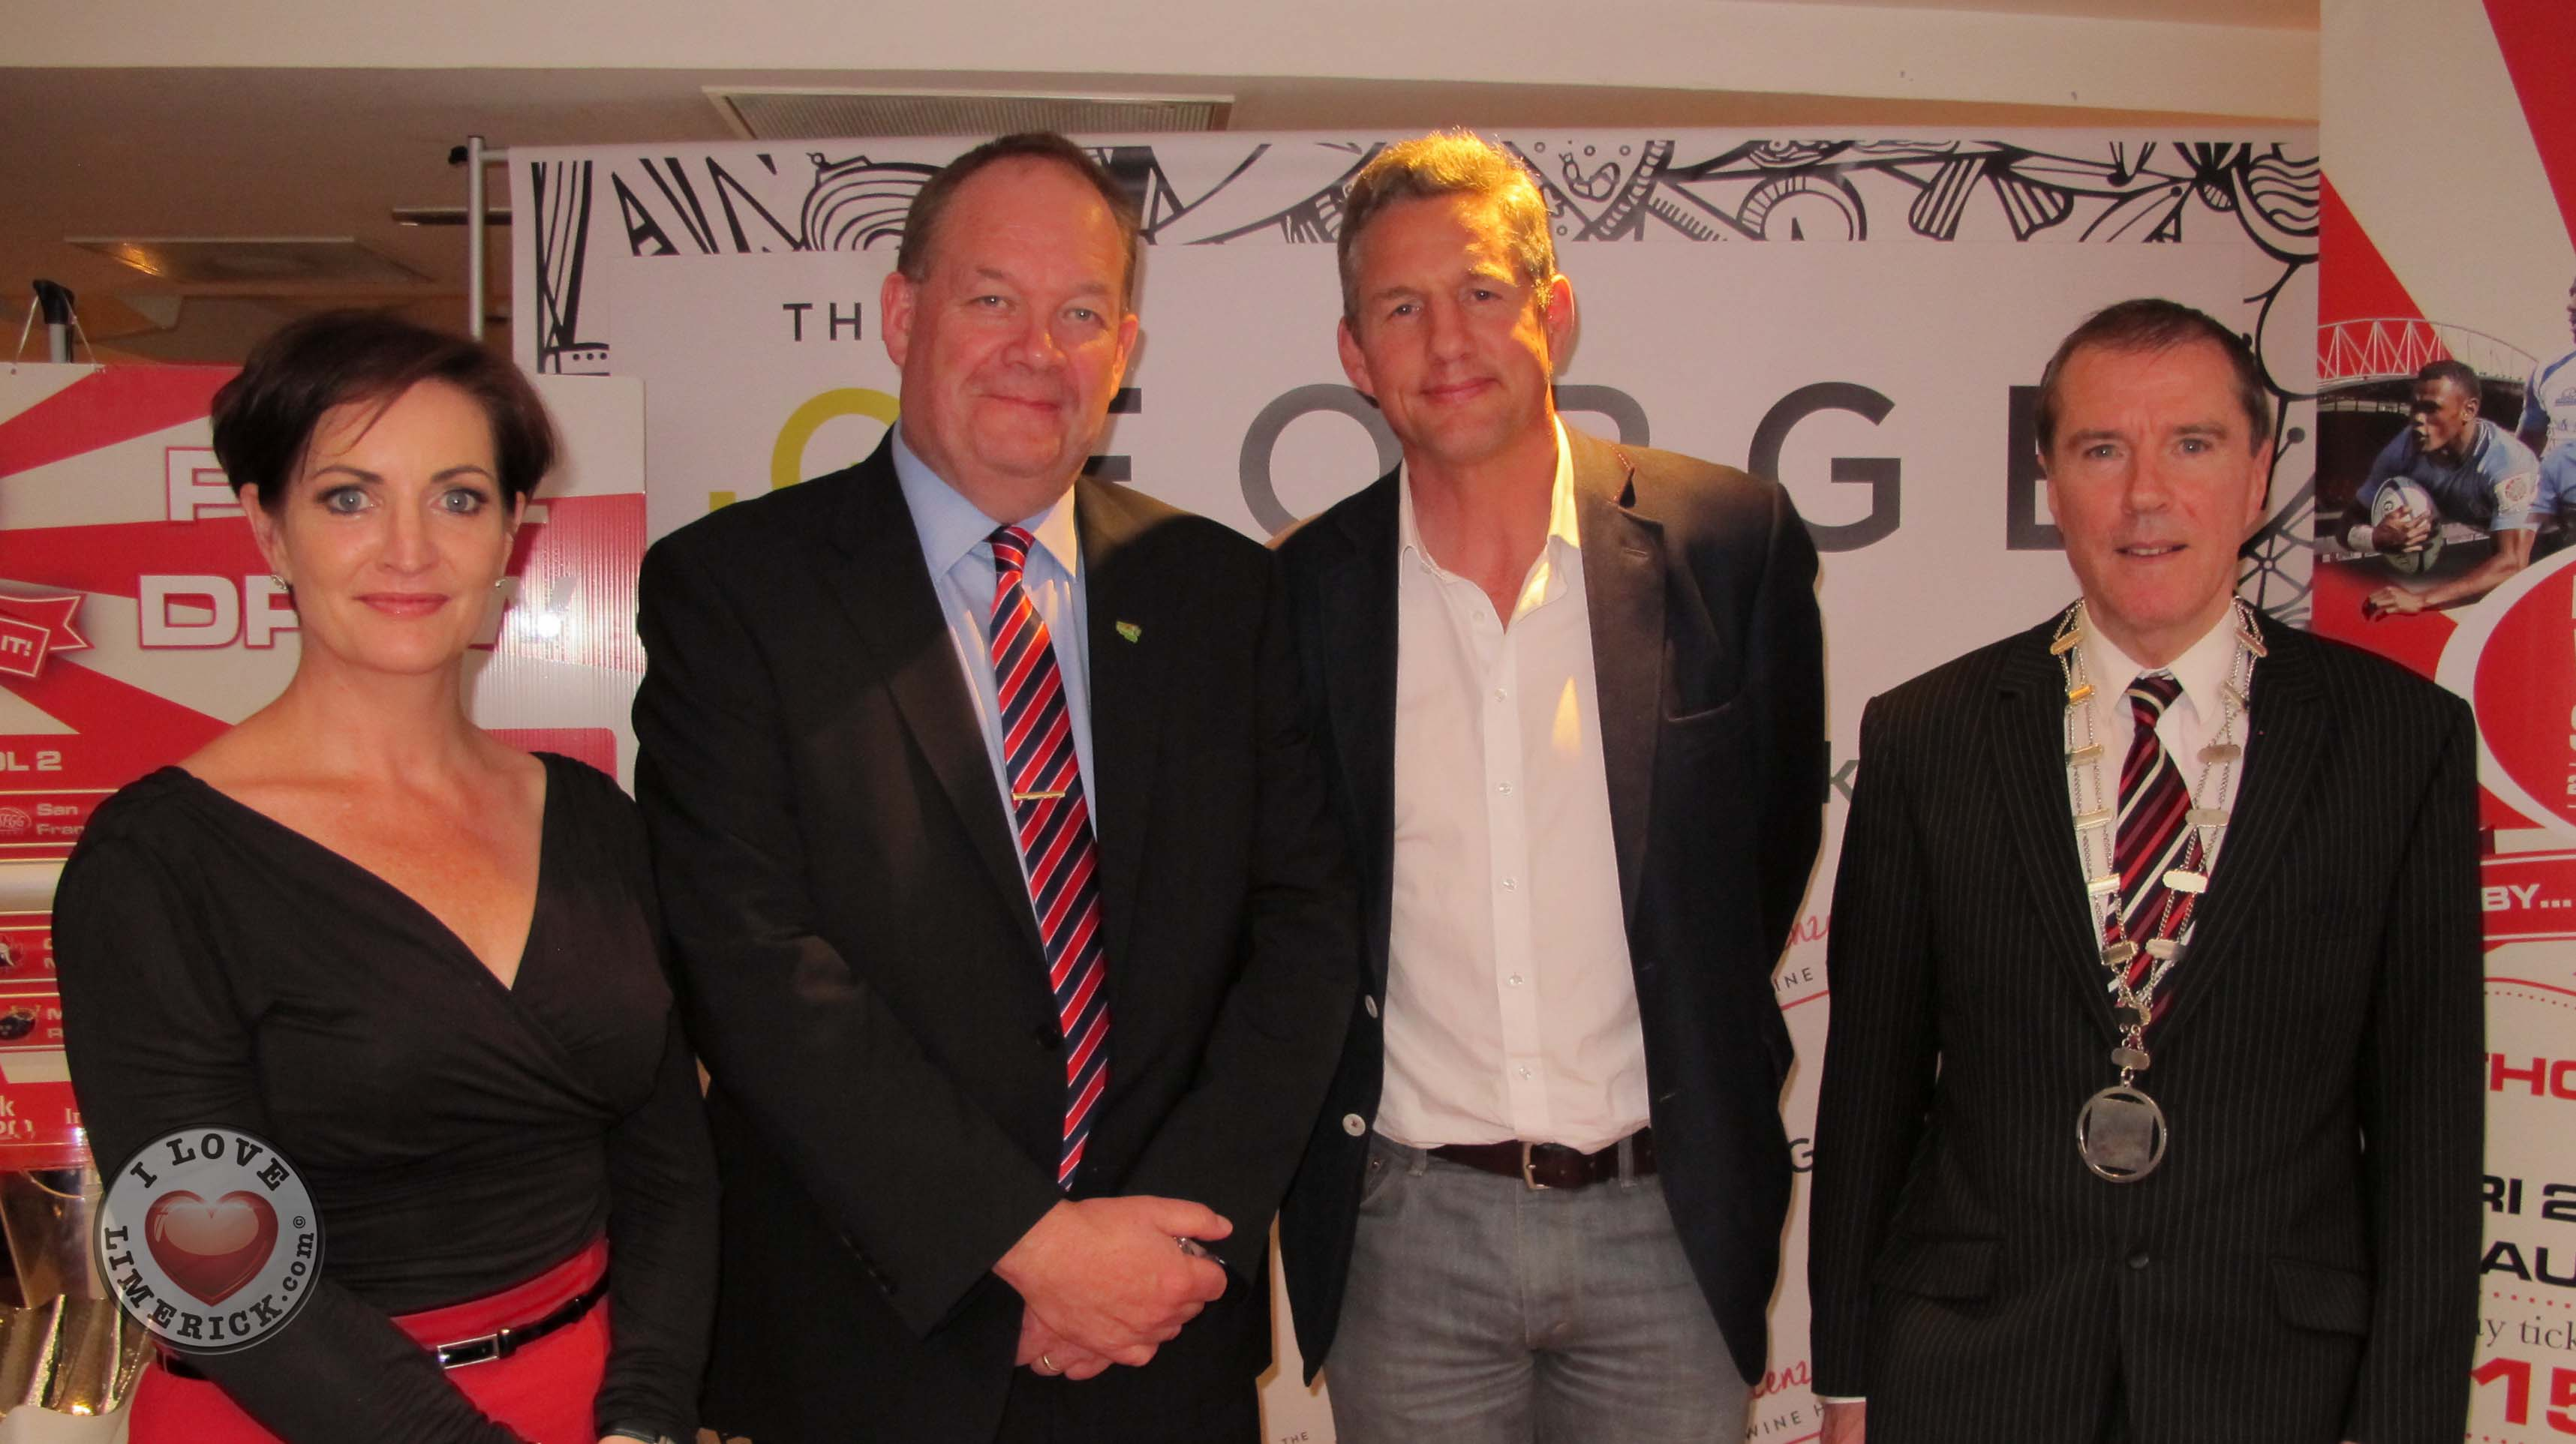 Limerick World Club Sevens Series returns for 2015